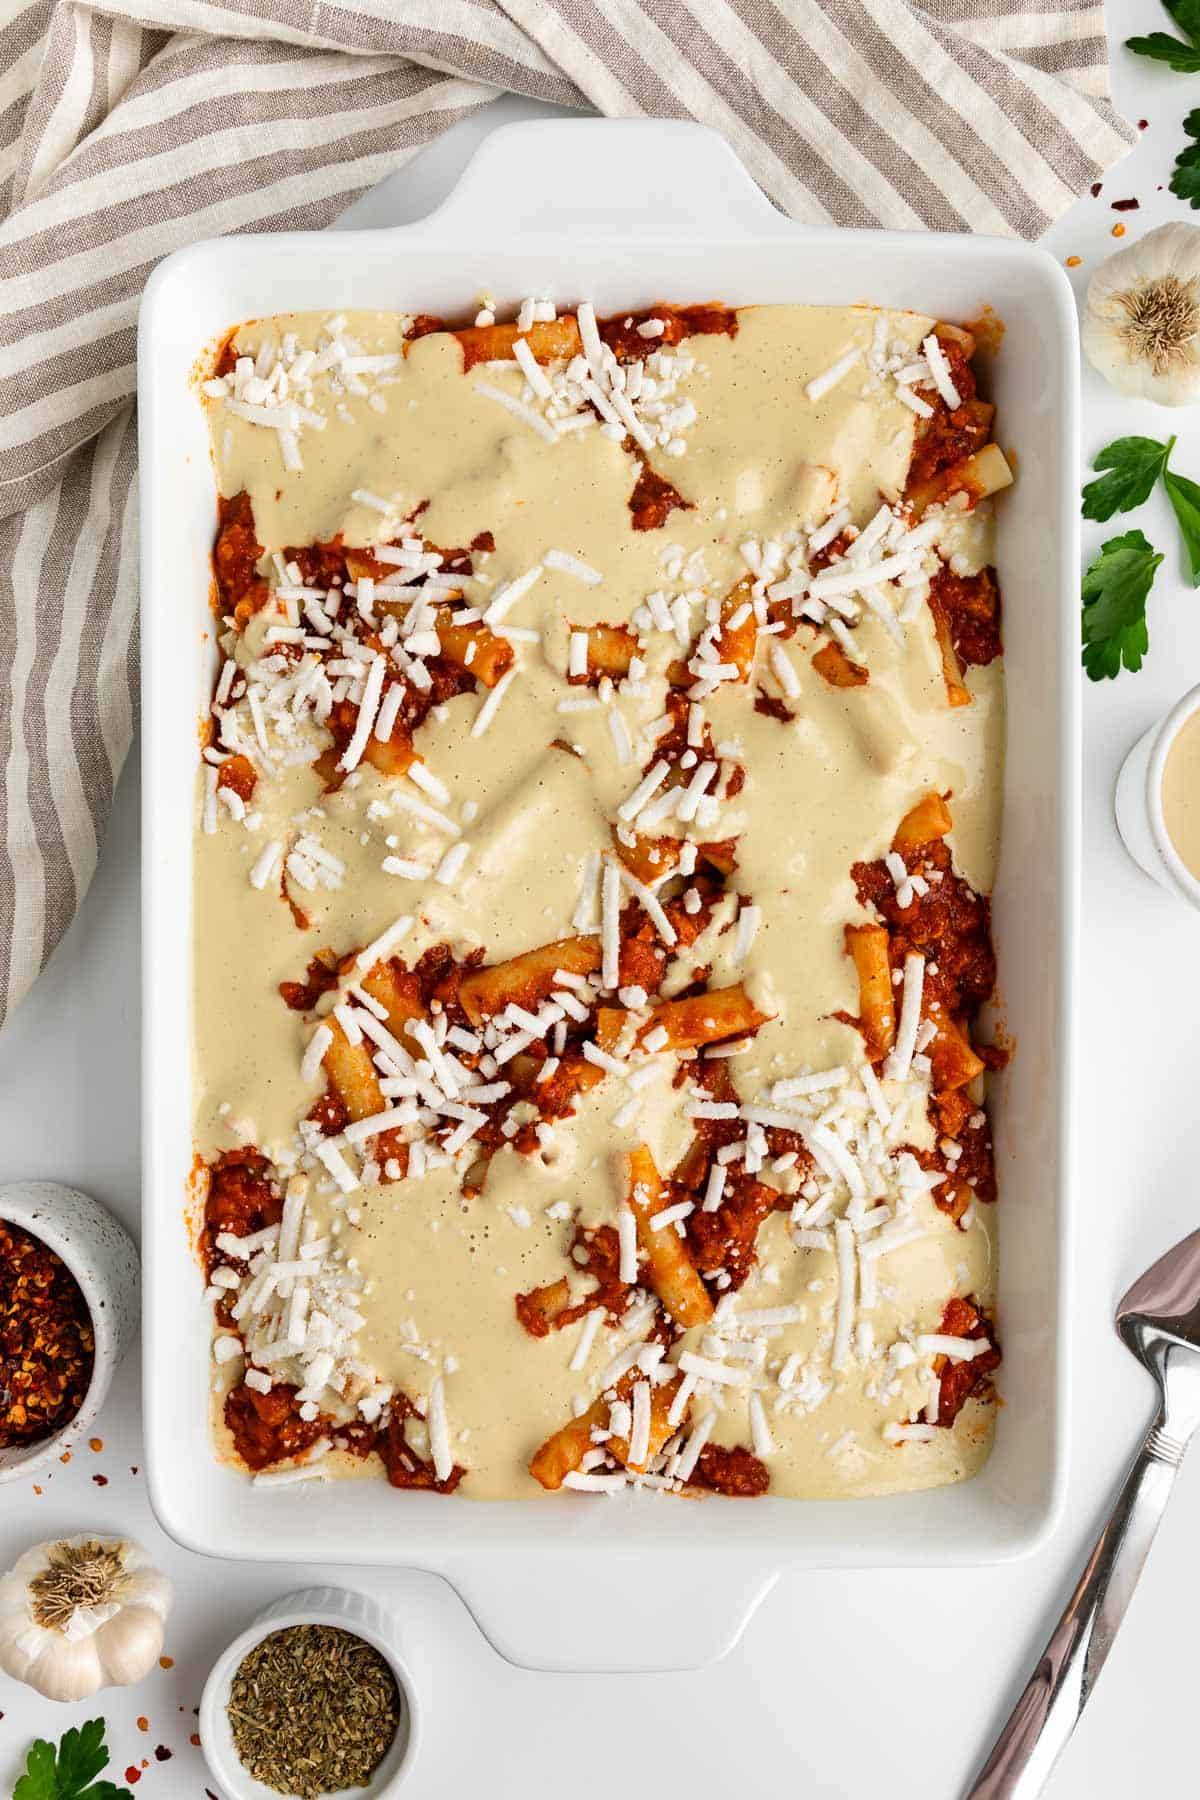 a white casserole dish with marinara sauce, ziti sauce, cashew cream, and vegan mozzarella inside it